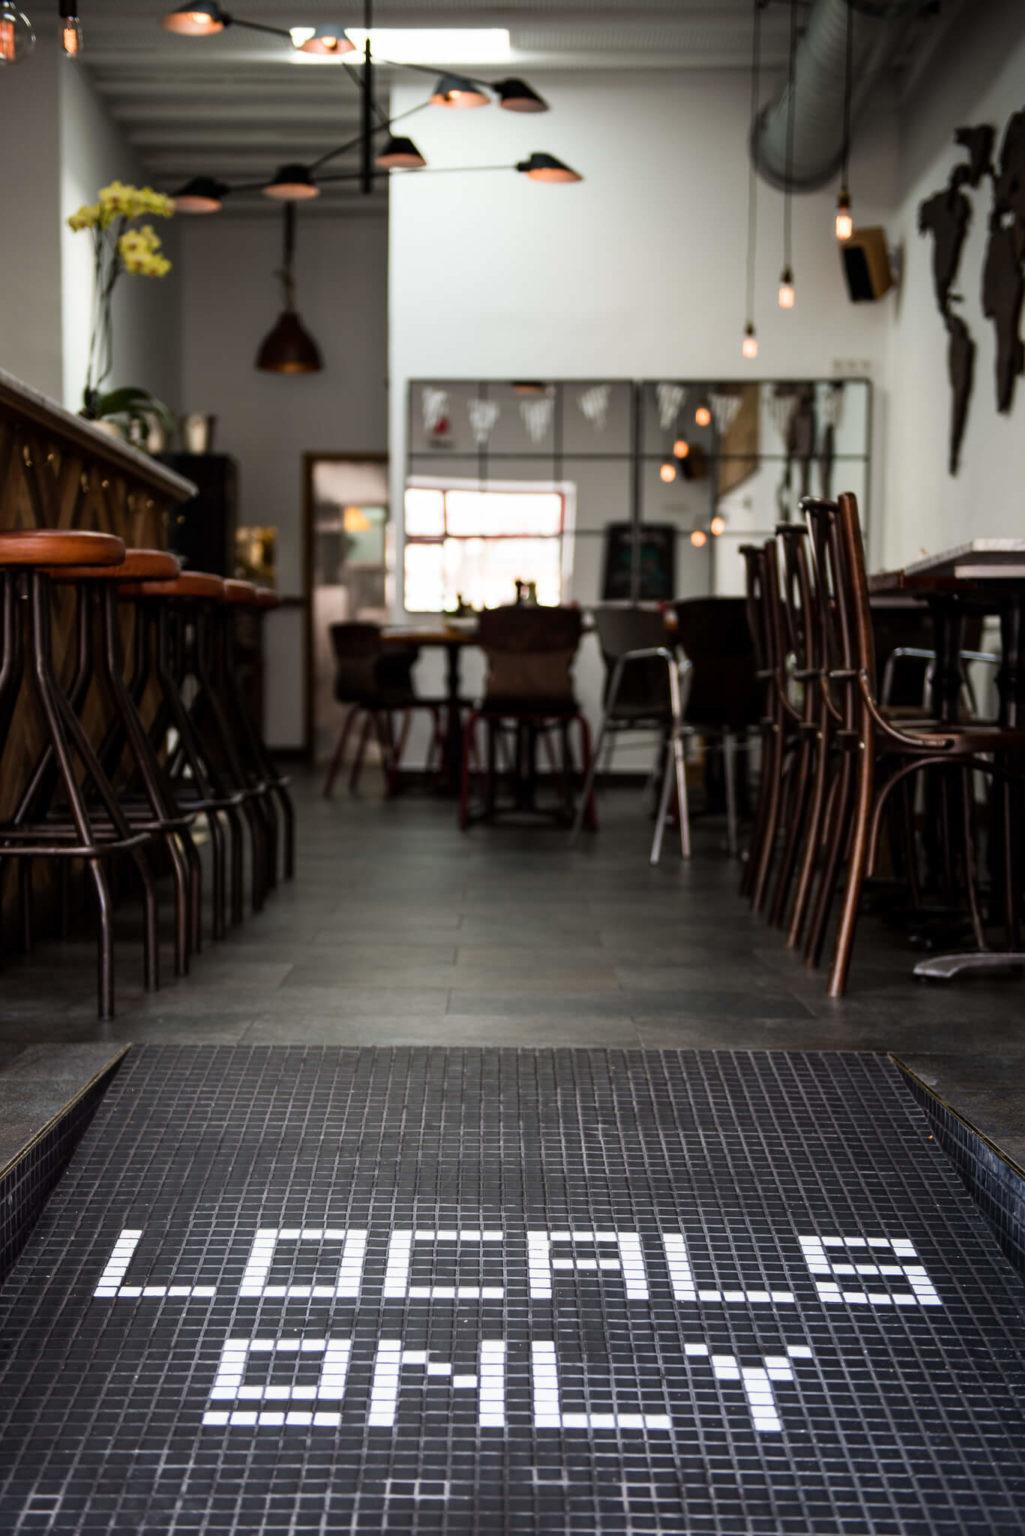 https://www.white-ibiza.com/wp-content/uploads/2020/03/white-ibiza-restaurants-locals-only-2020-00-1025x1536.jpg